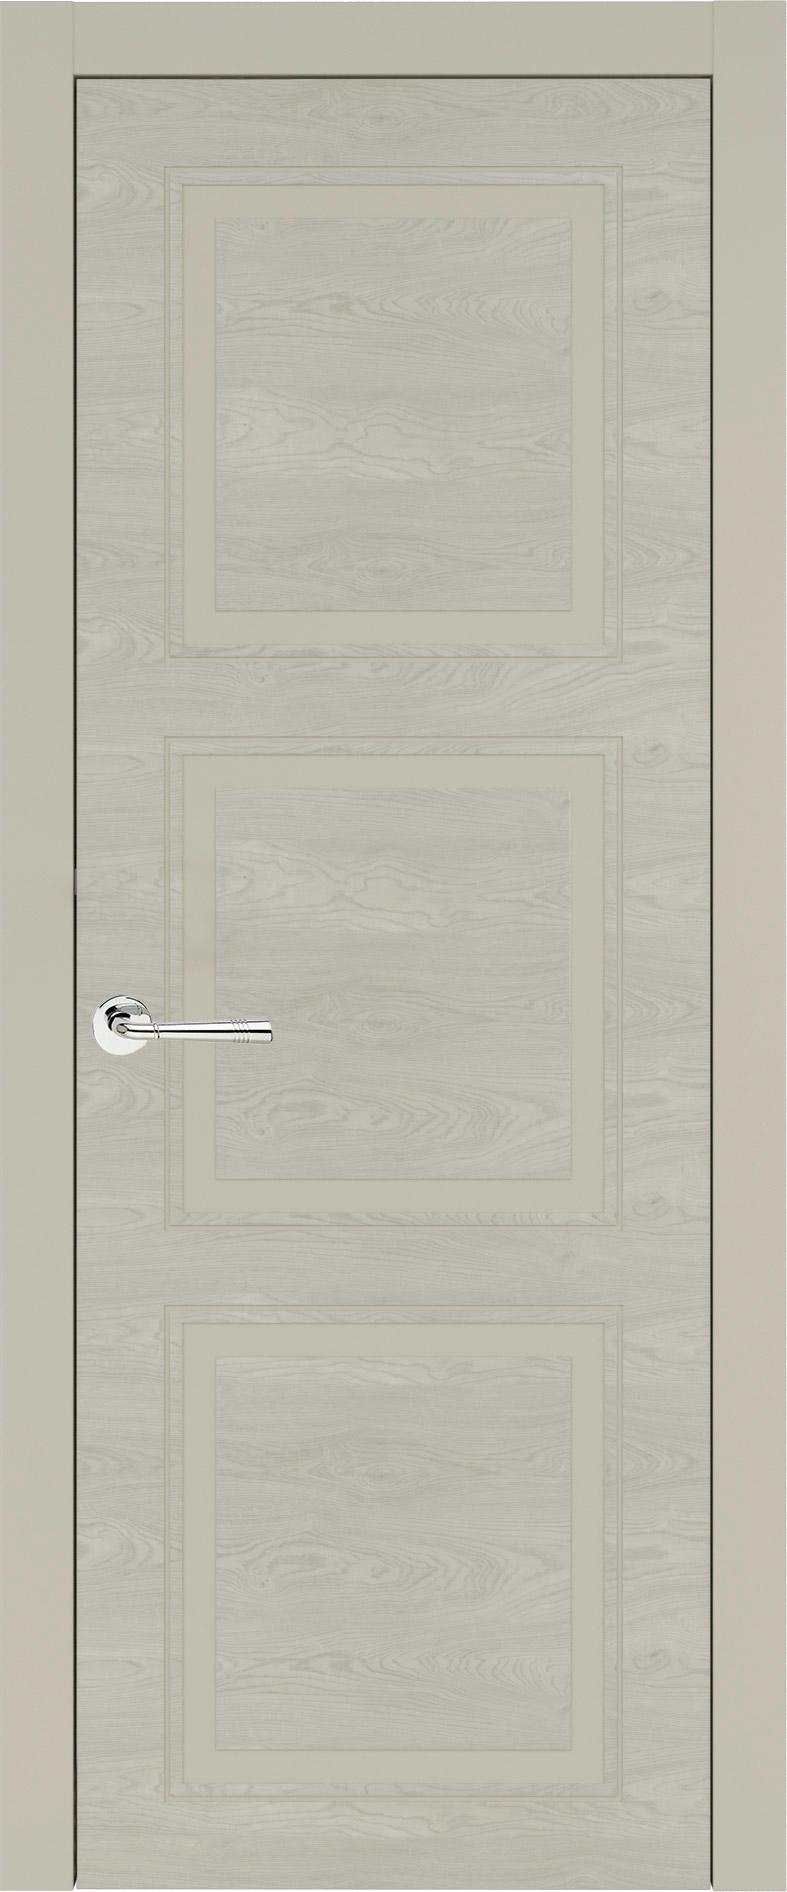 Milano Neo Classic цвет - Серо-оливковая эмаль по шпону (RAL 7032) Без стекла (ДГ)